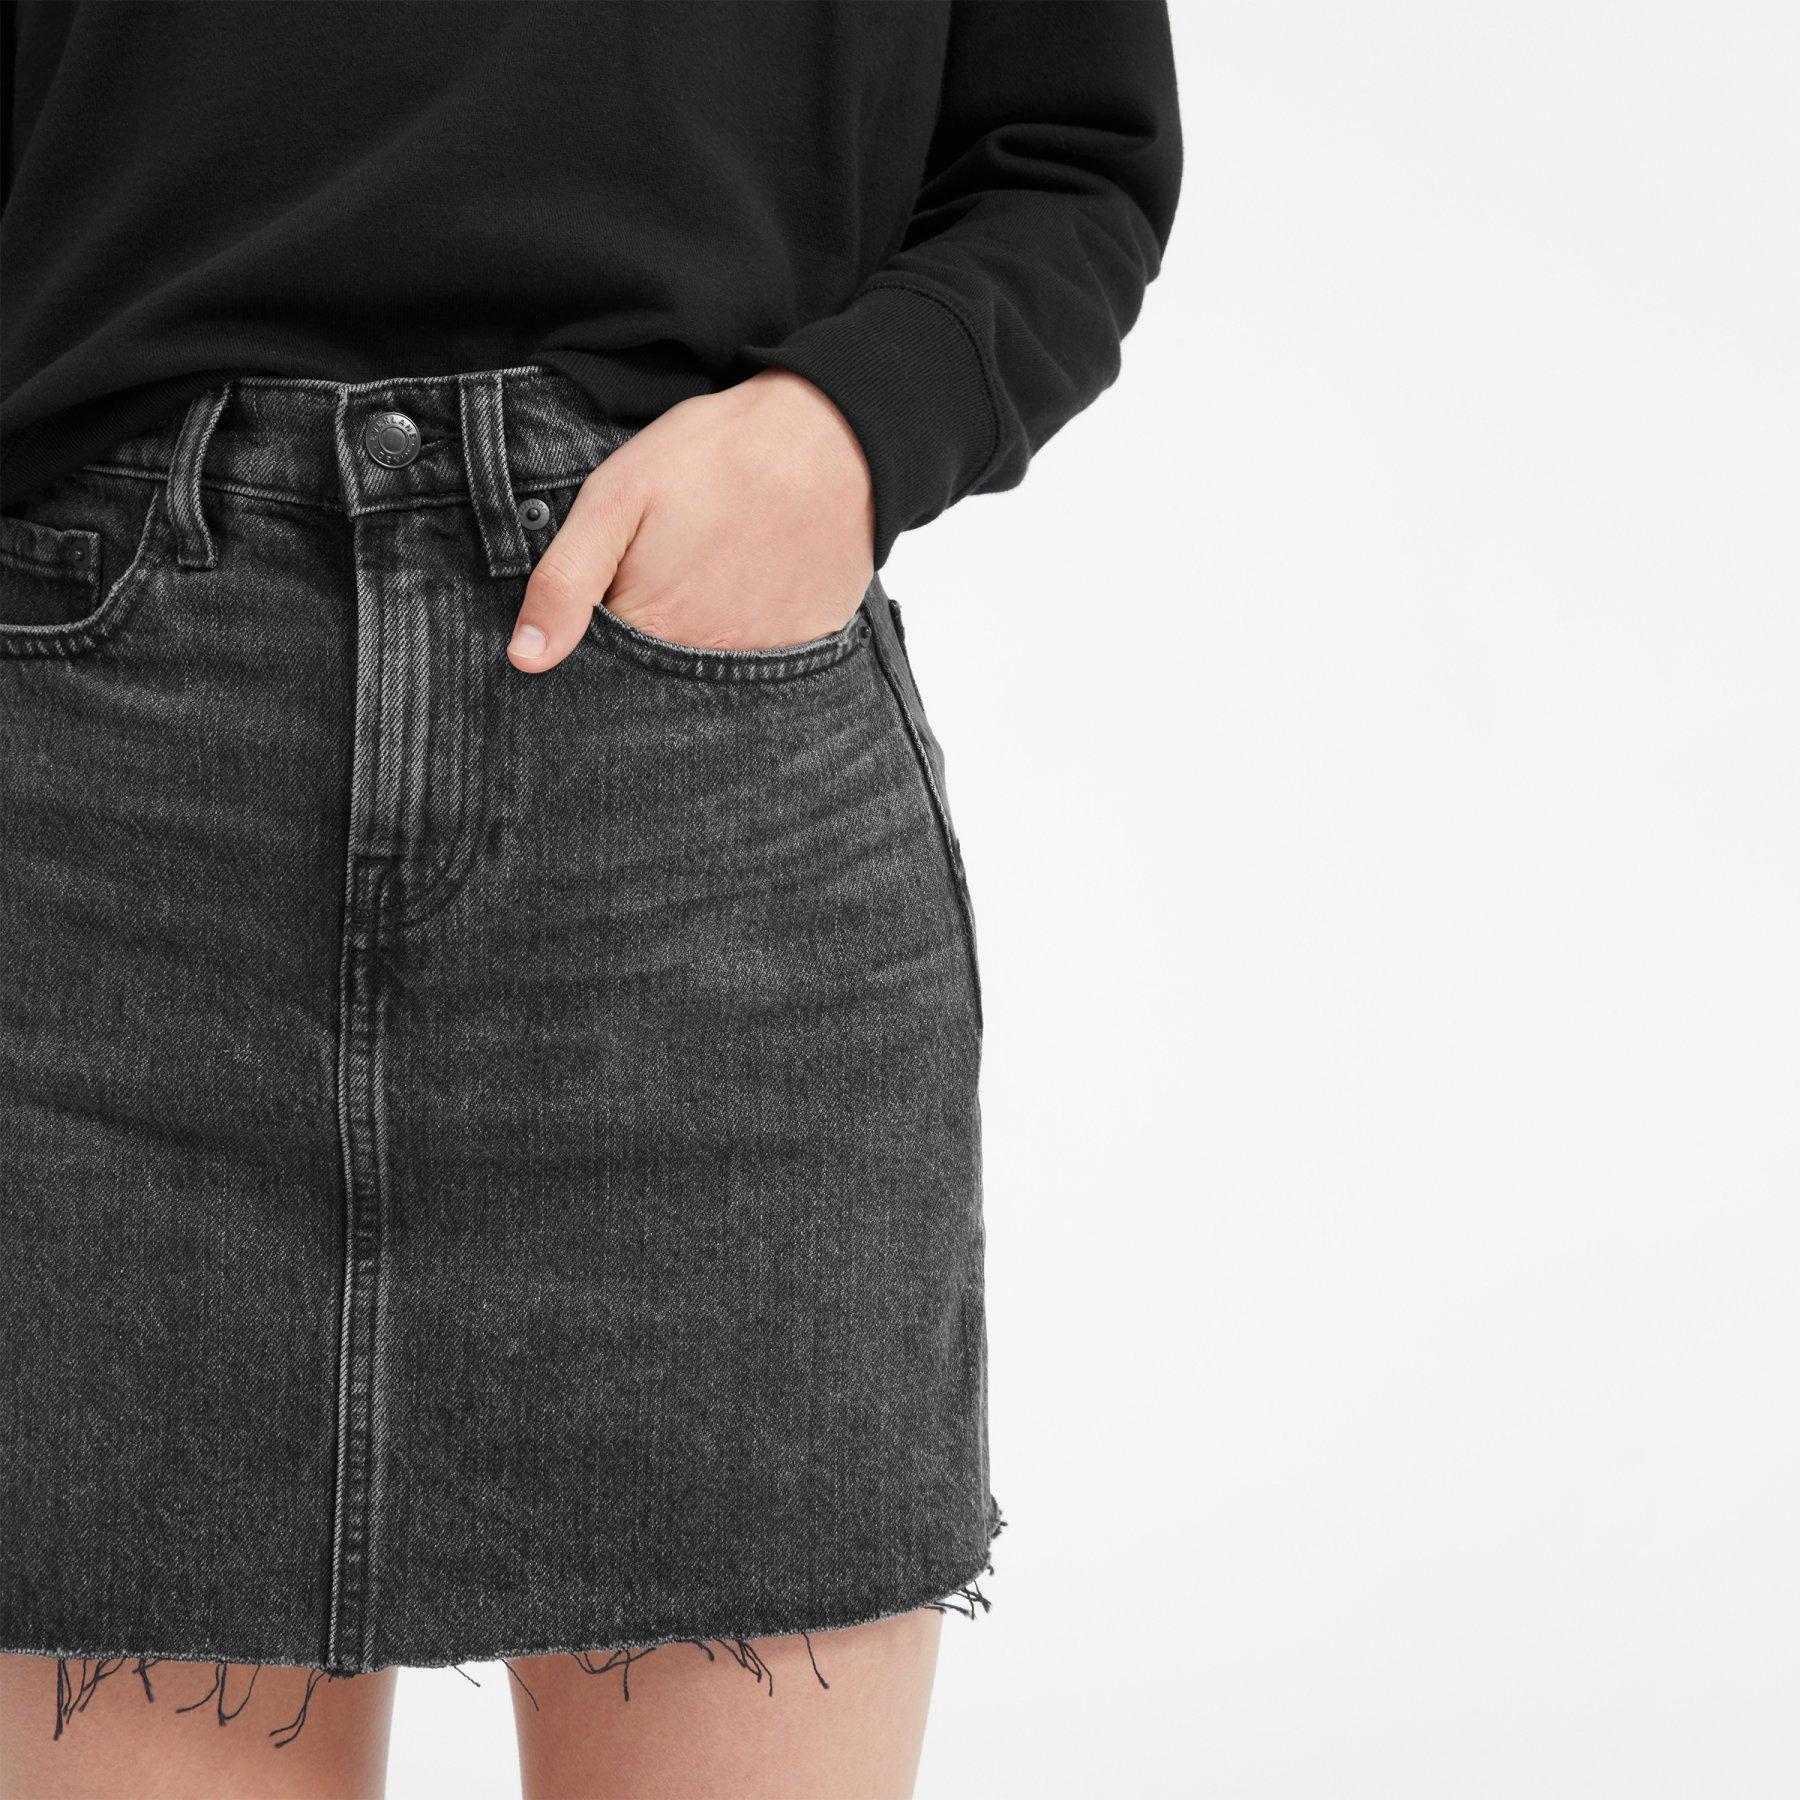 Denim Skirt with Raw Hem - $58